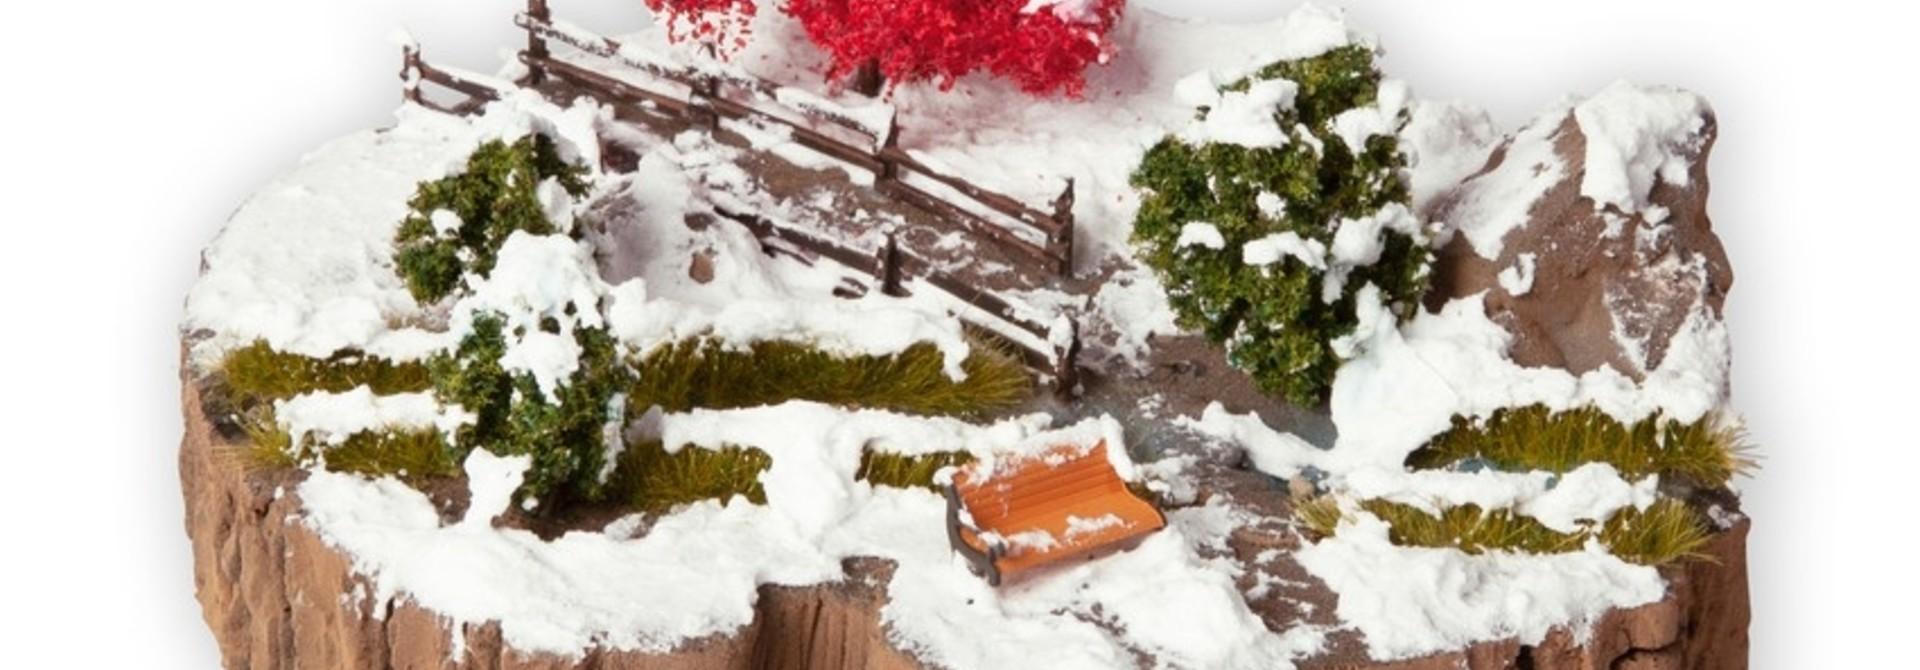 "10003 Diorama Kit ""Winter dream"""